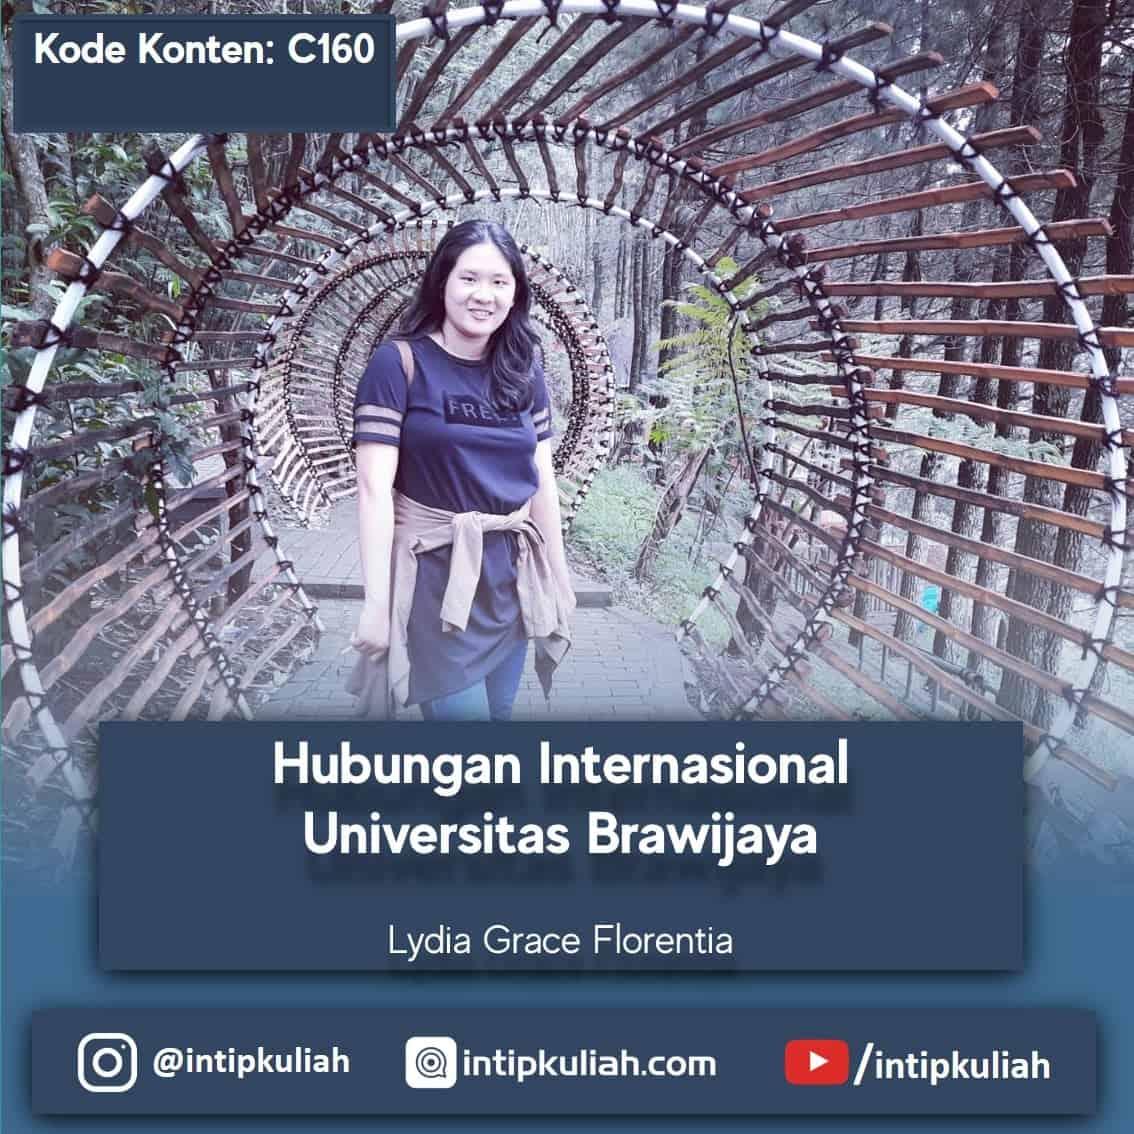 Hubungan Internasional Universitas Brawijaya (Lydia)